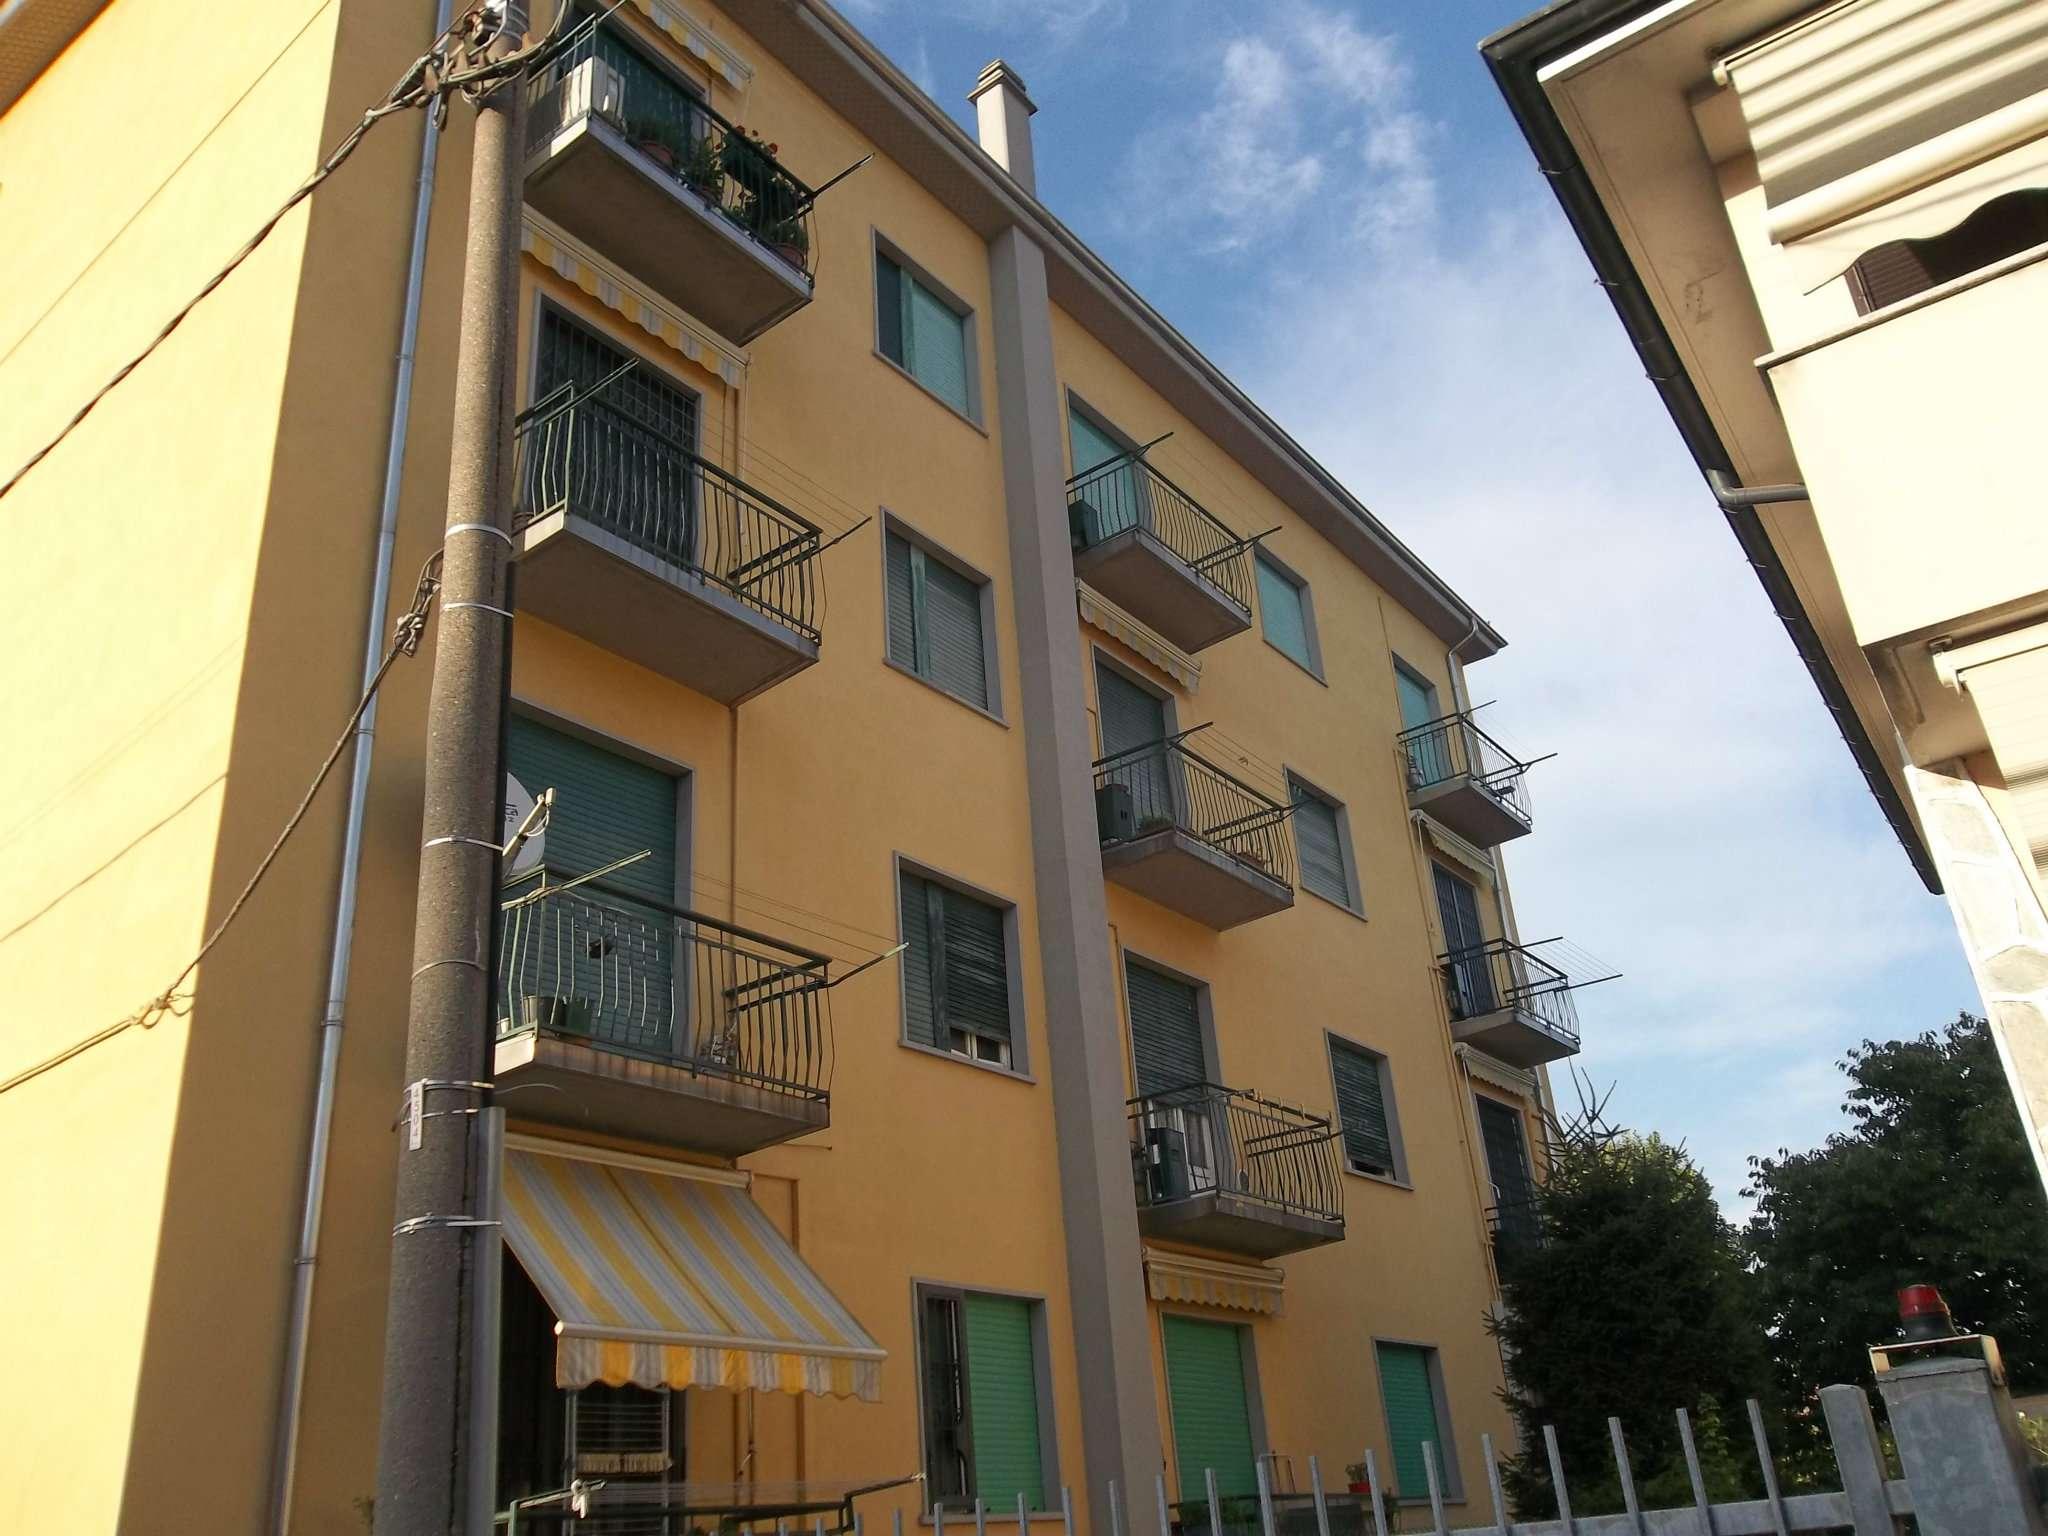 Bilocale Paderno Dugnano Via Espinasse 4